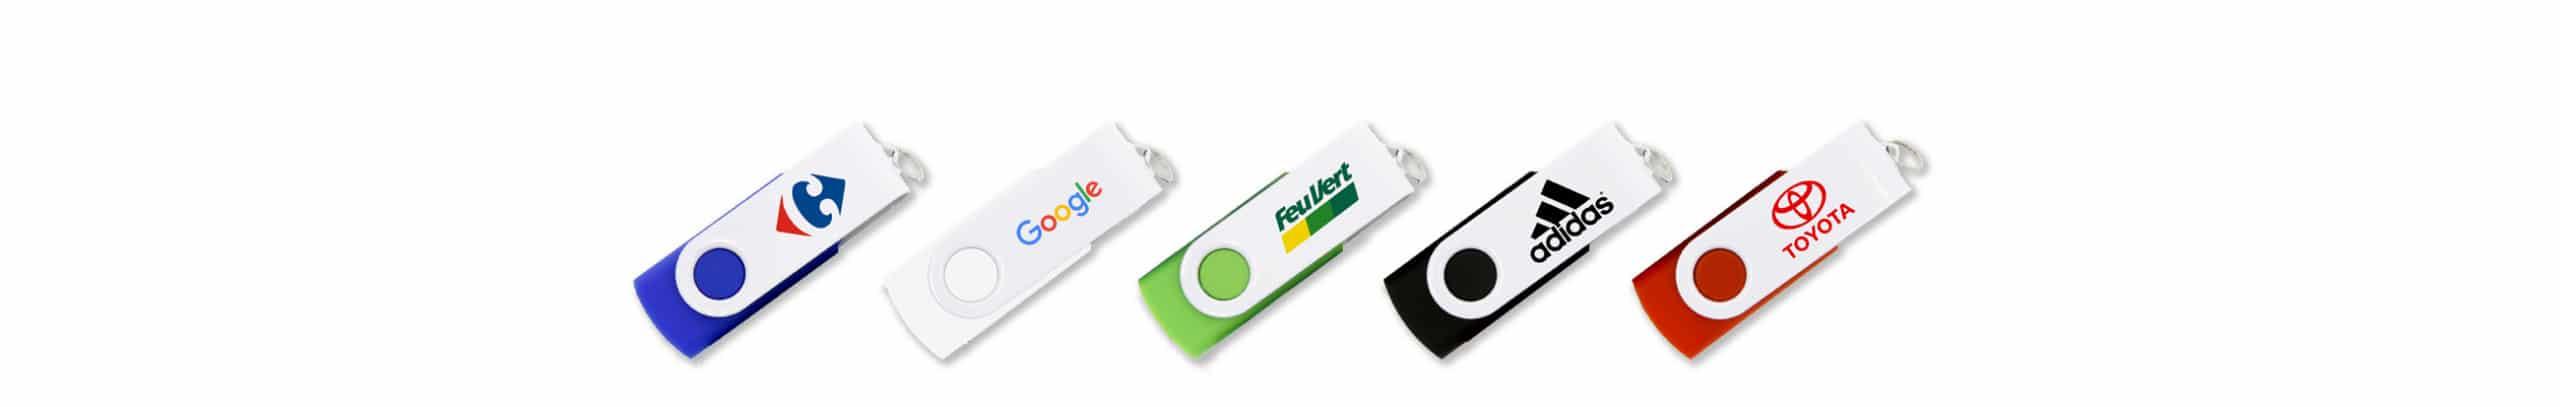 lot de clés usb personnalisables Twister Snow avec logo FeuVert, Addidas, Toyota